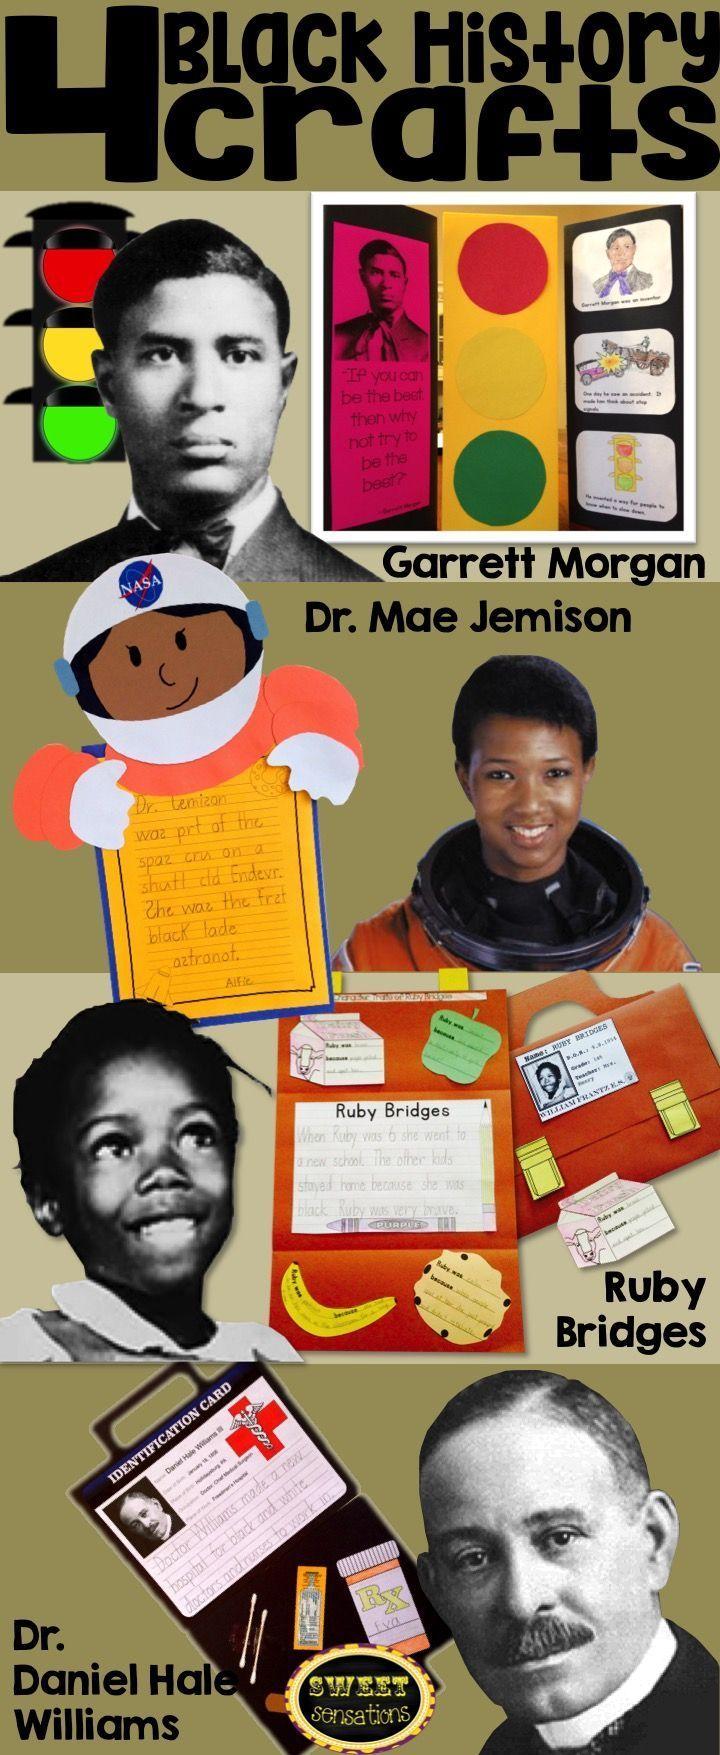 Photo of Black History Month Crafts | Mae Jemison | Garrett Morgan | Ruby Bridges